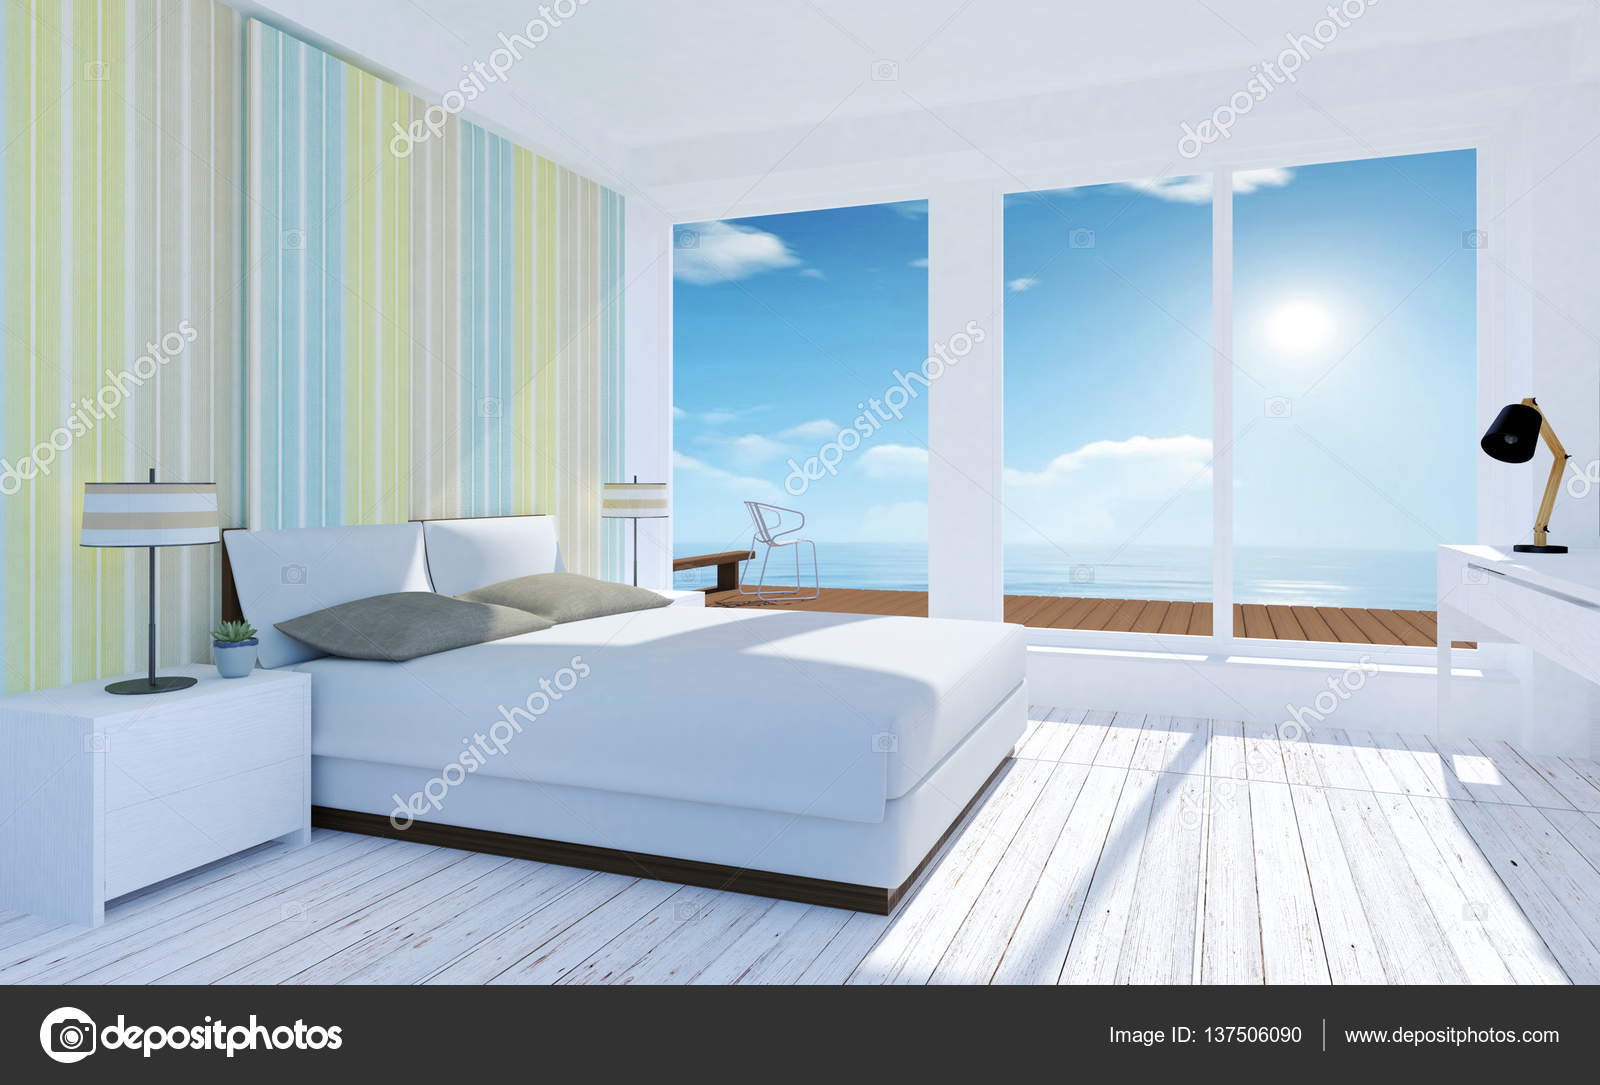 https://st3.depositphotos.com/6733070/13750/i/1600/depositphotos_137506090-stockafbeelding-witte-en-gezellige-minimale-slaapkamer.jpg